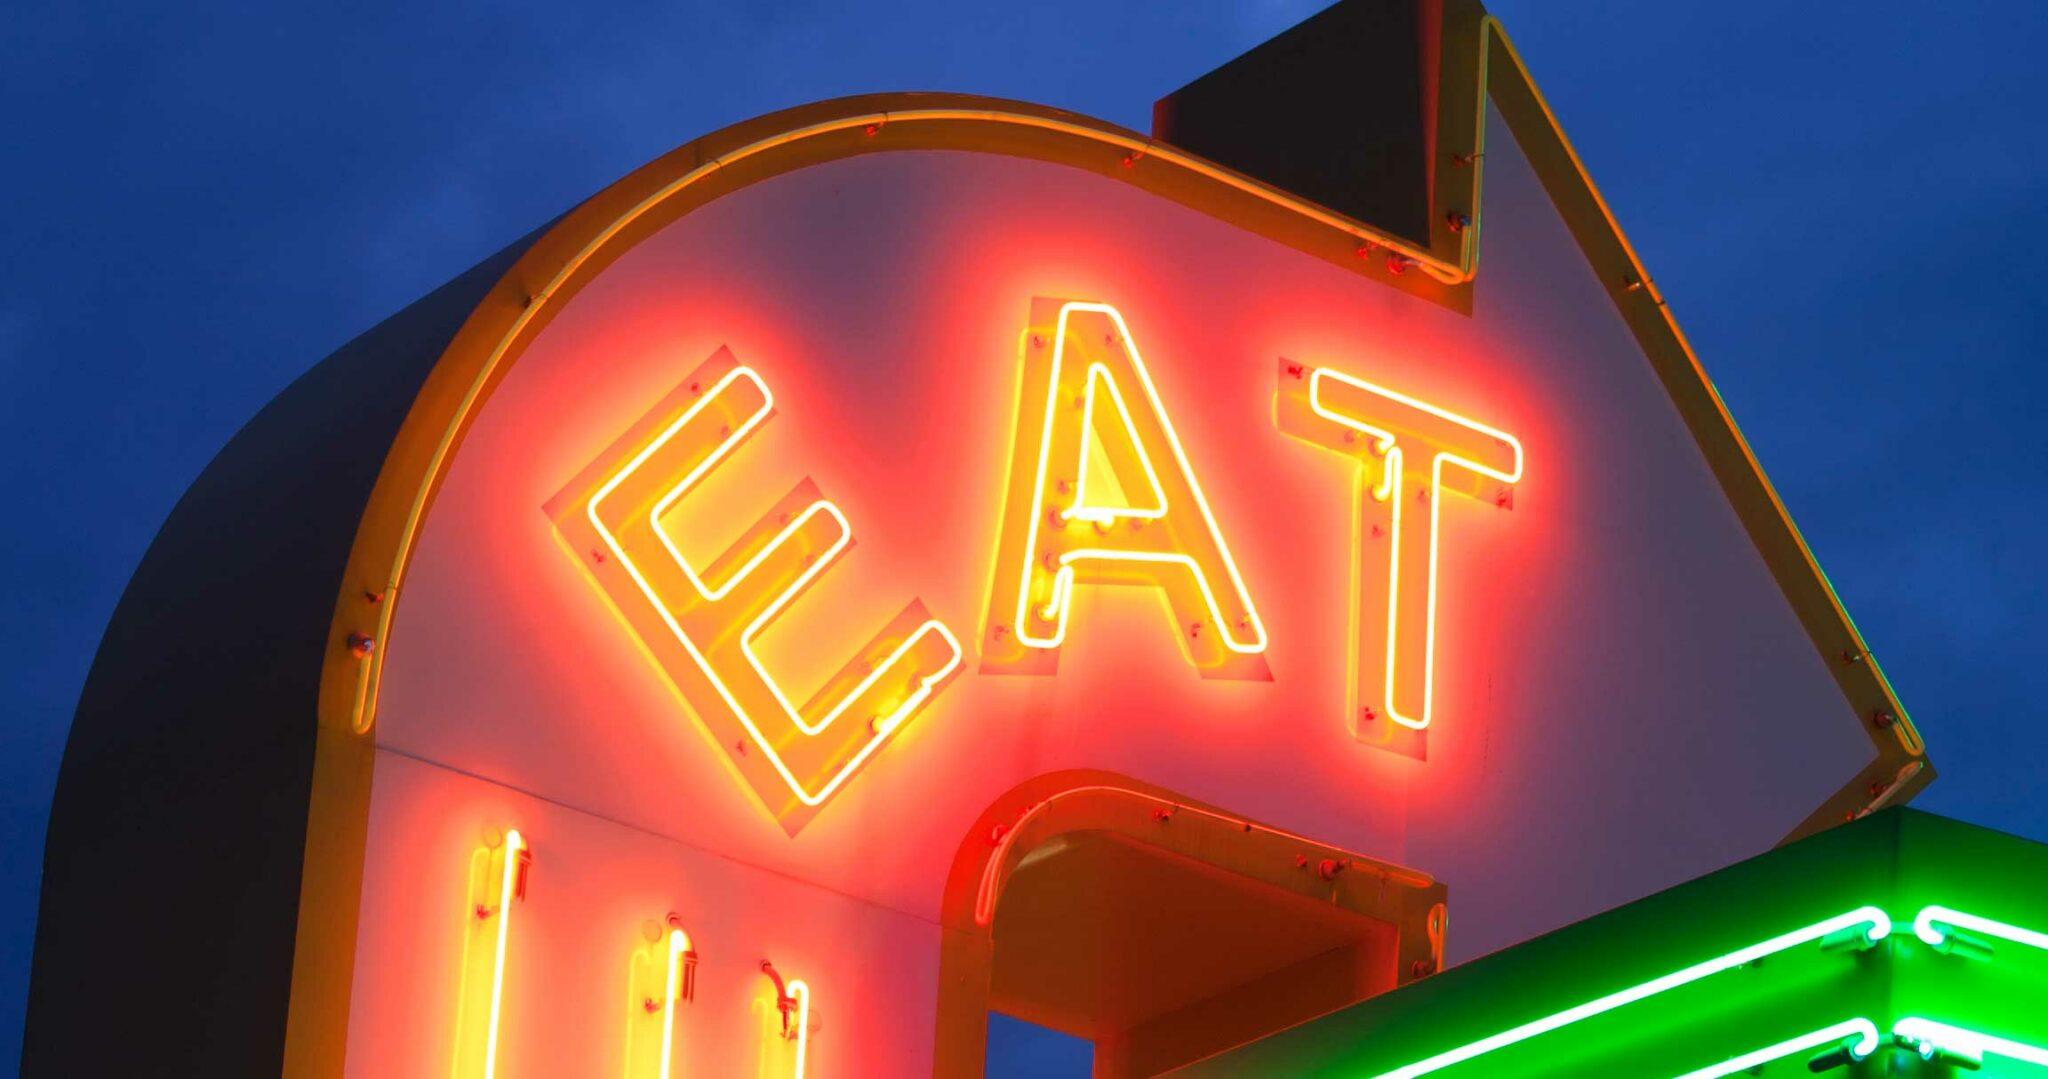 Fast Food Restaurants Questionnaire